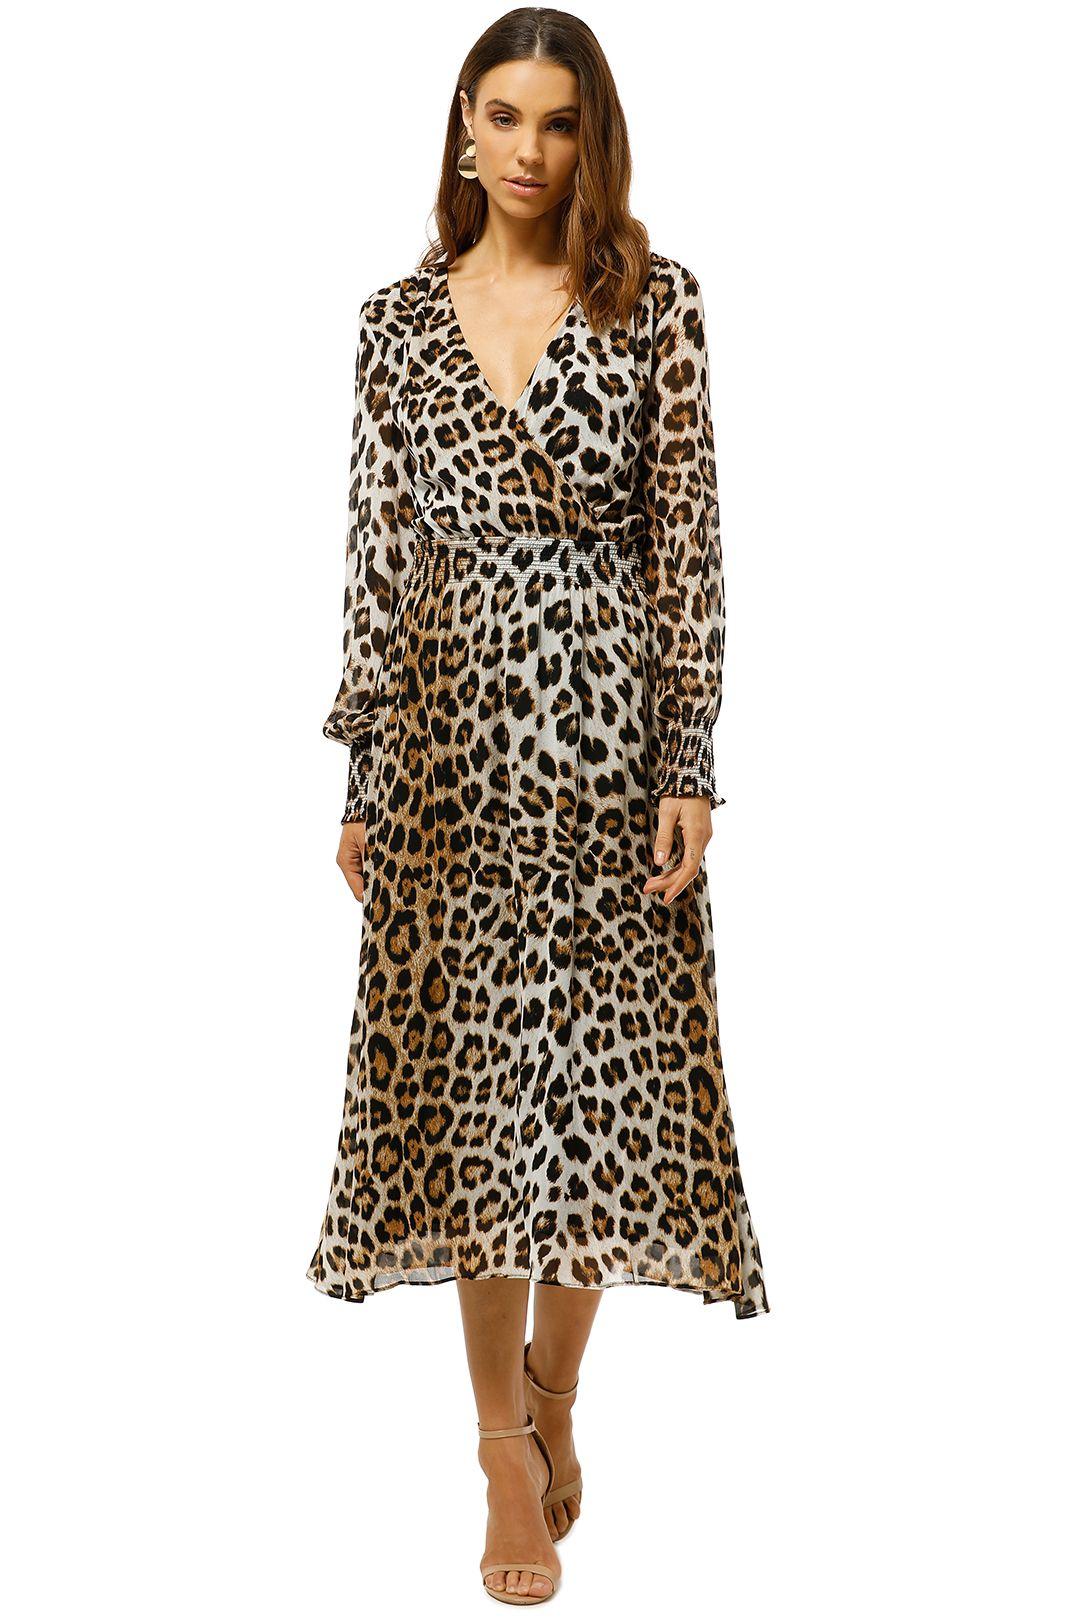 Witchery-Animal-Print-Dress-Ocelot-Front